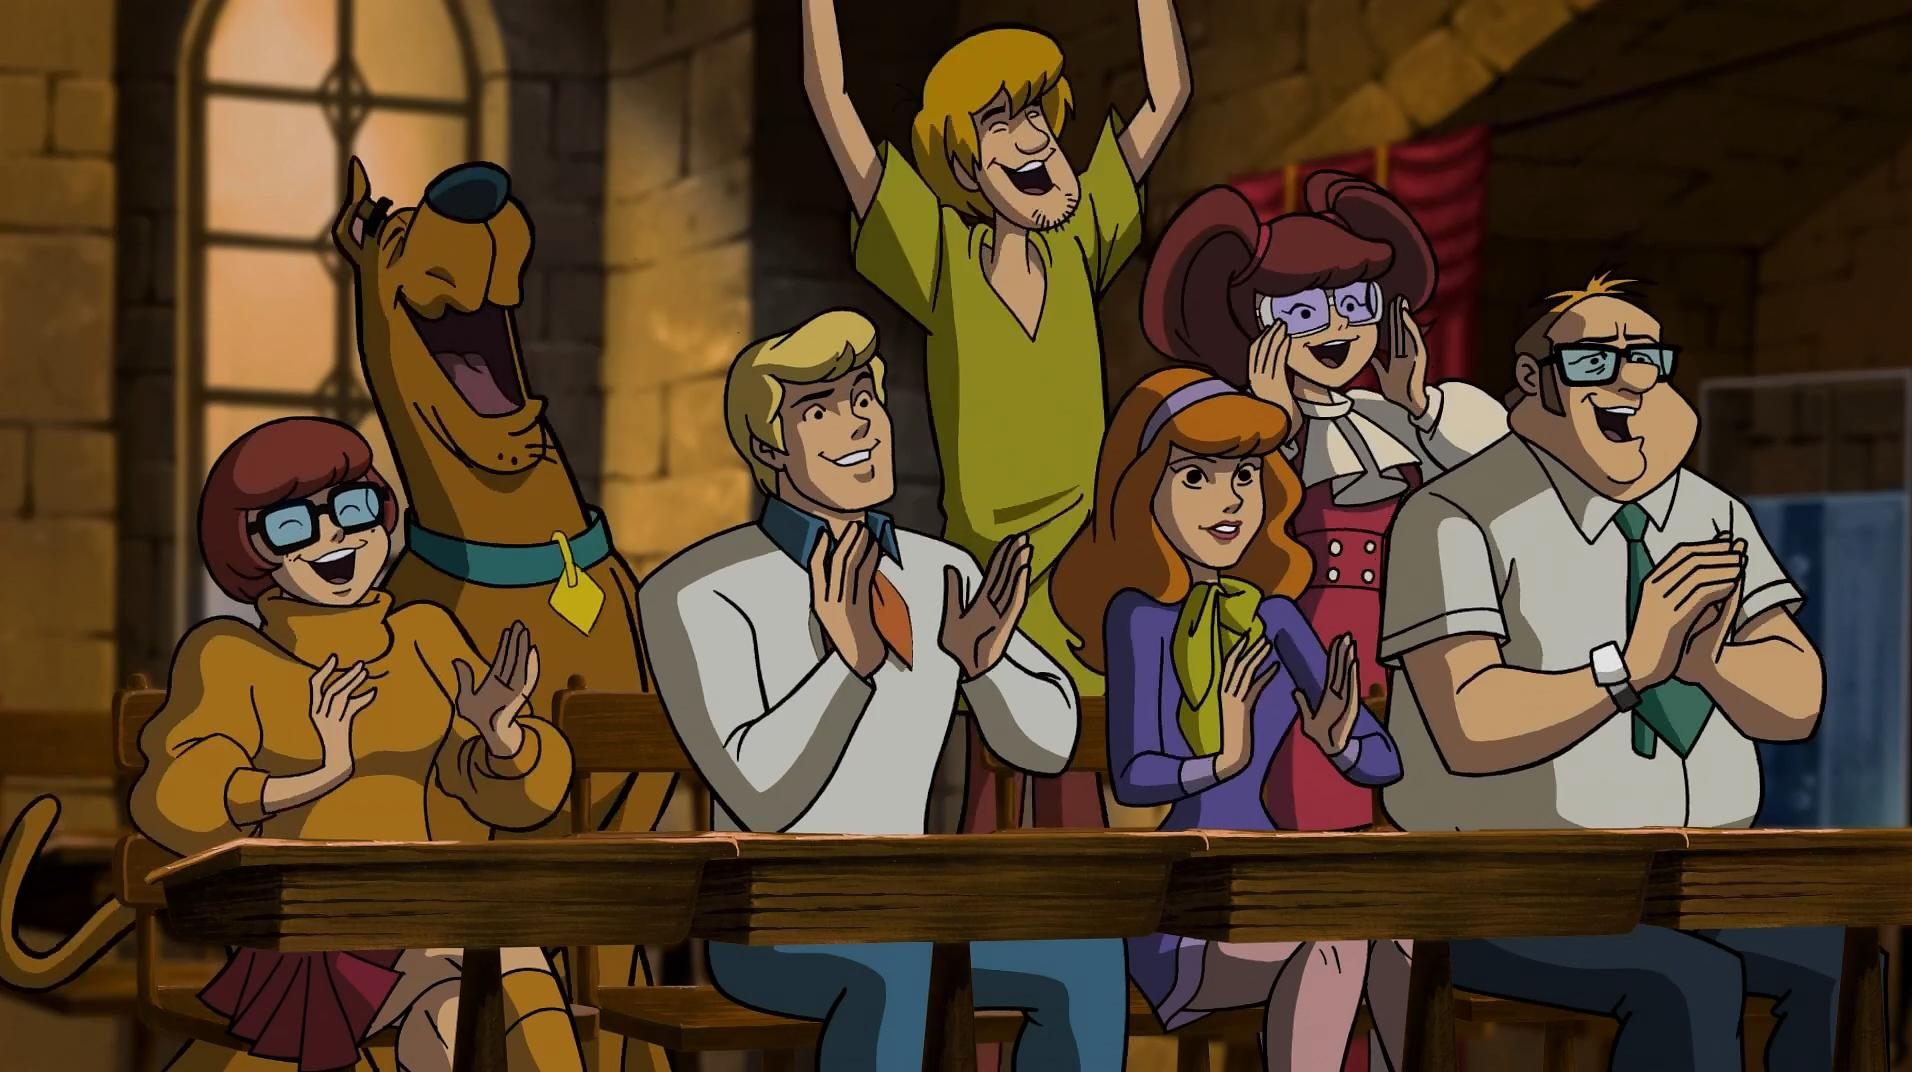 Matthew Lillard, Danica McKellar, Mindy Cohn, Grey Griffin, Brian Posehn, and Frank Welker in Scooby-Doo! Abracadabra-Doo (2010)